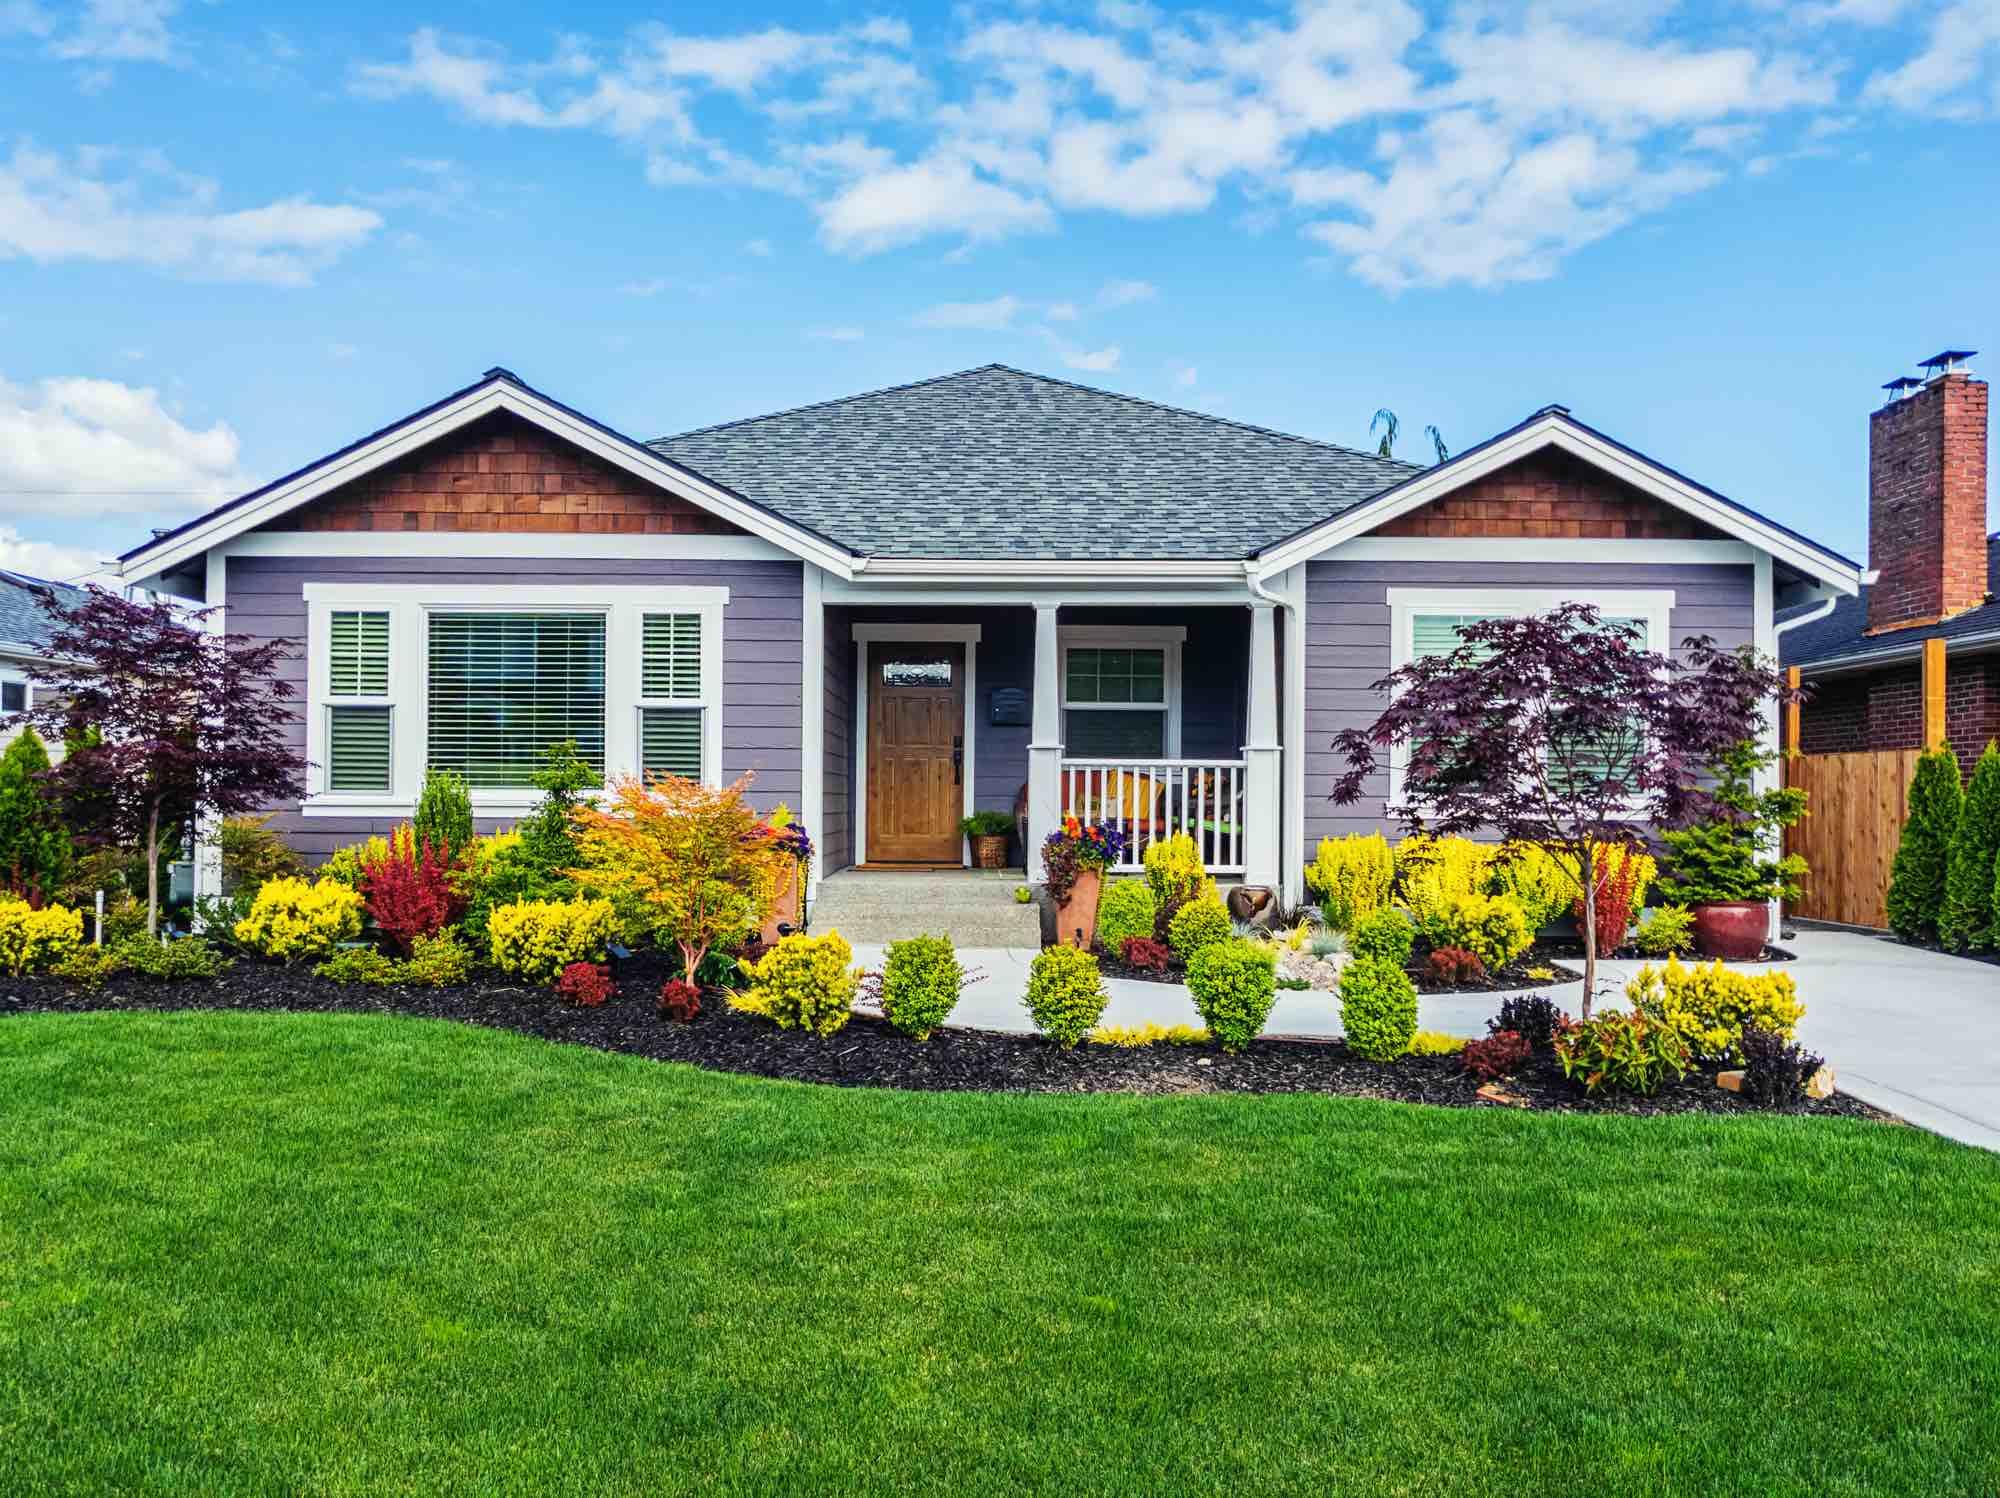 home-rotator-home-mortgage-b-1255835530